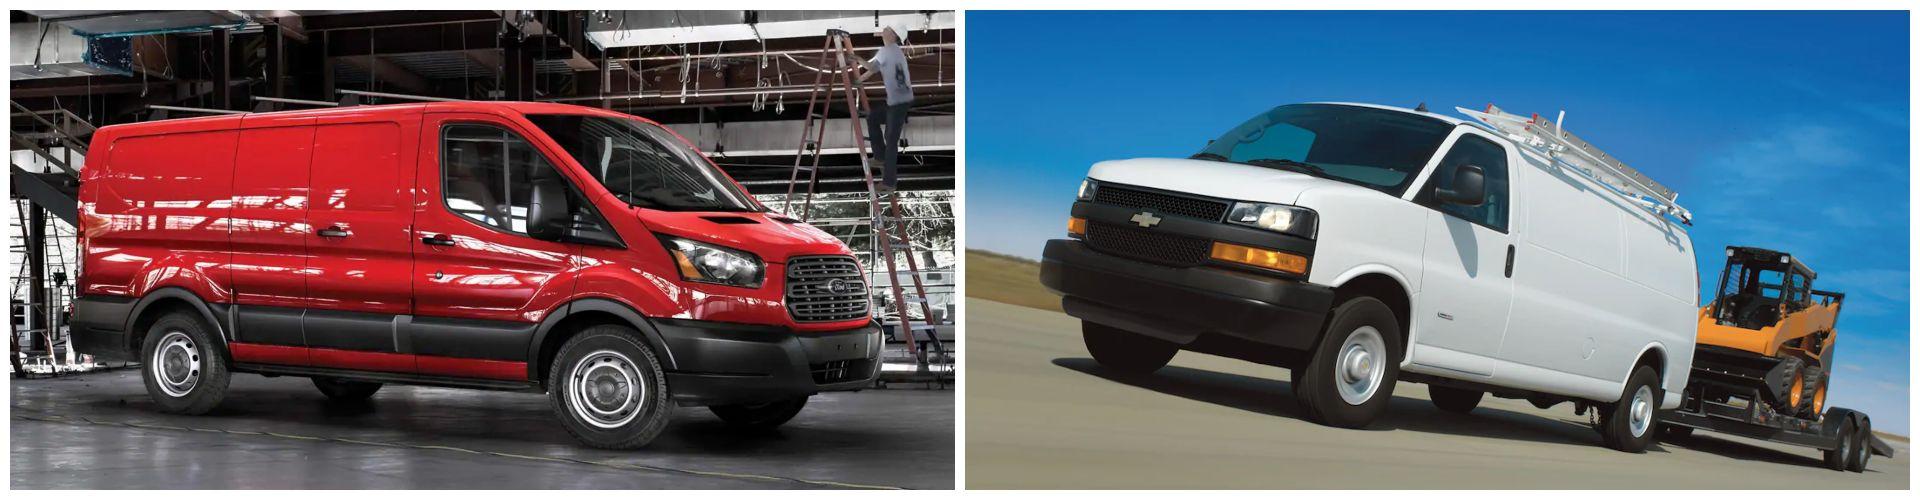 Performance - Ford Transit vs. Chevrolet Express